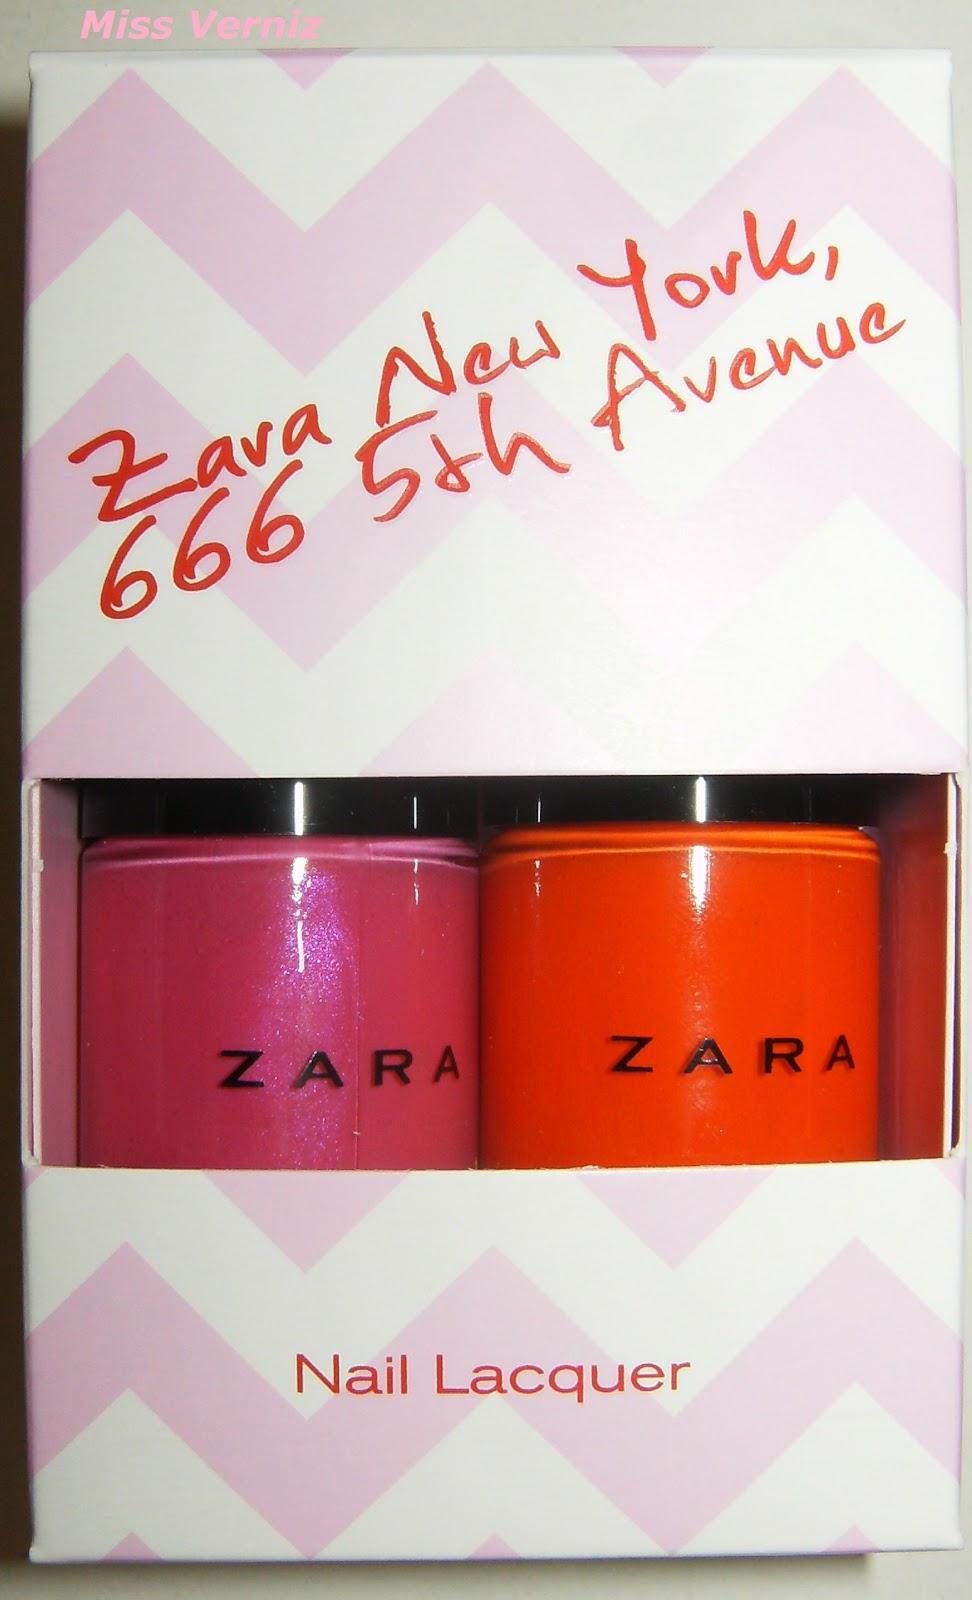 Miss Verniz  Conjunto Zara New York 666 5th Avenue...!!!! 6df52995287